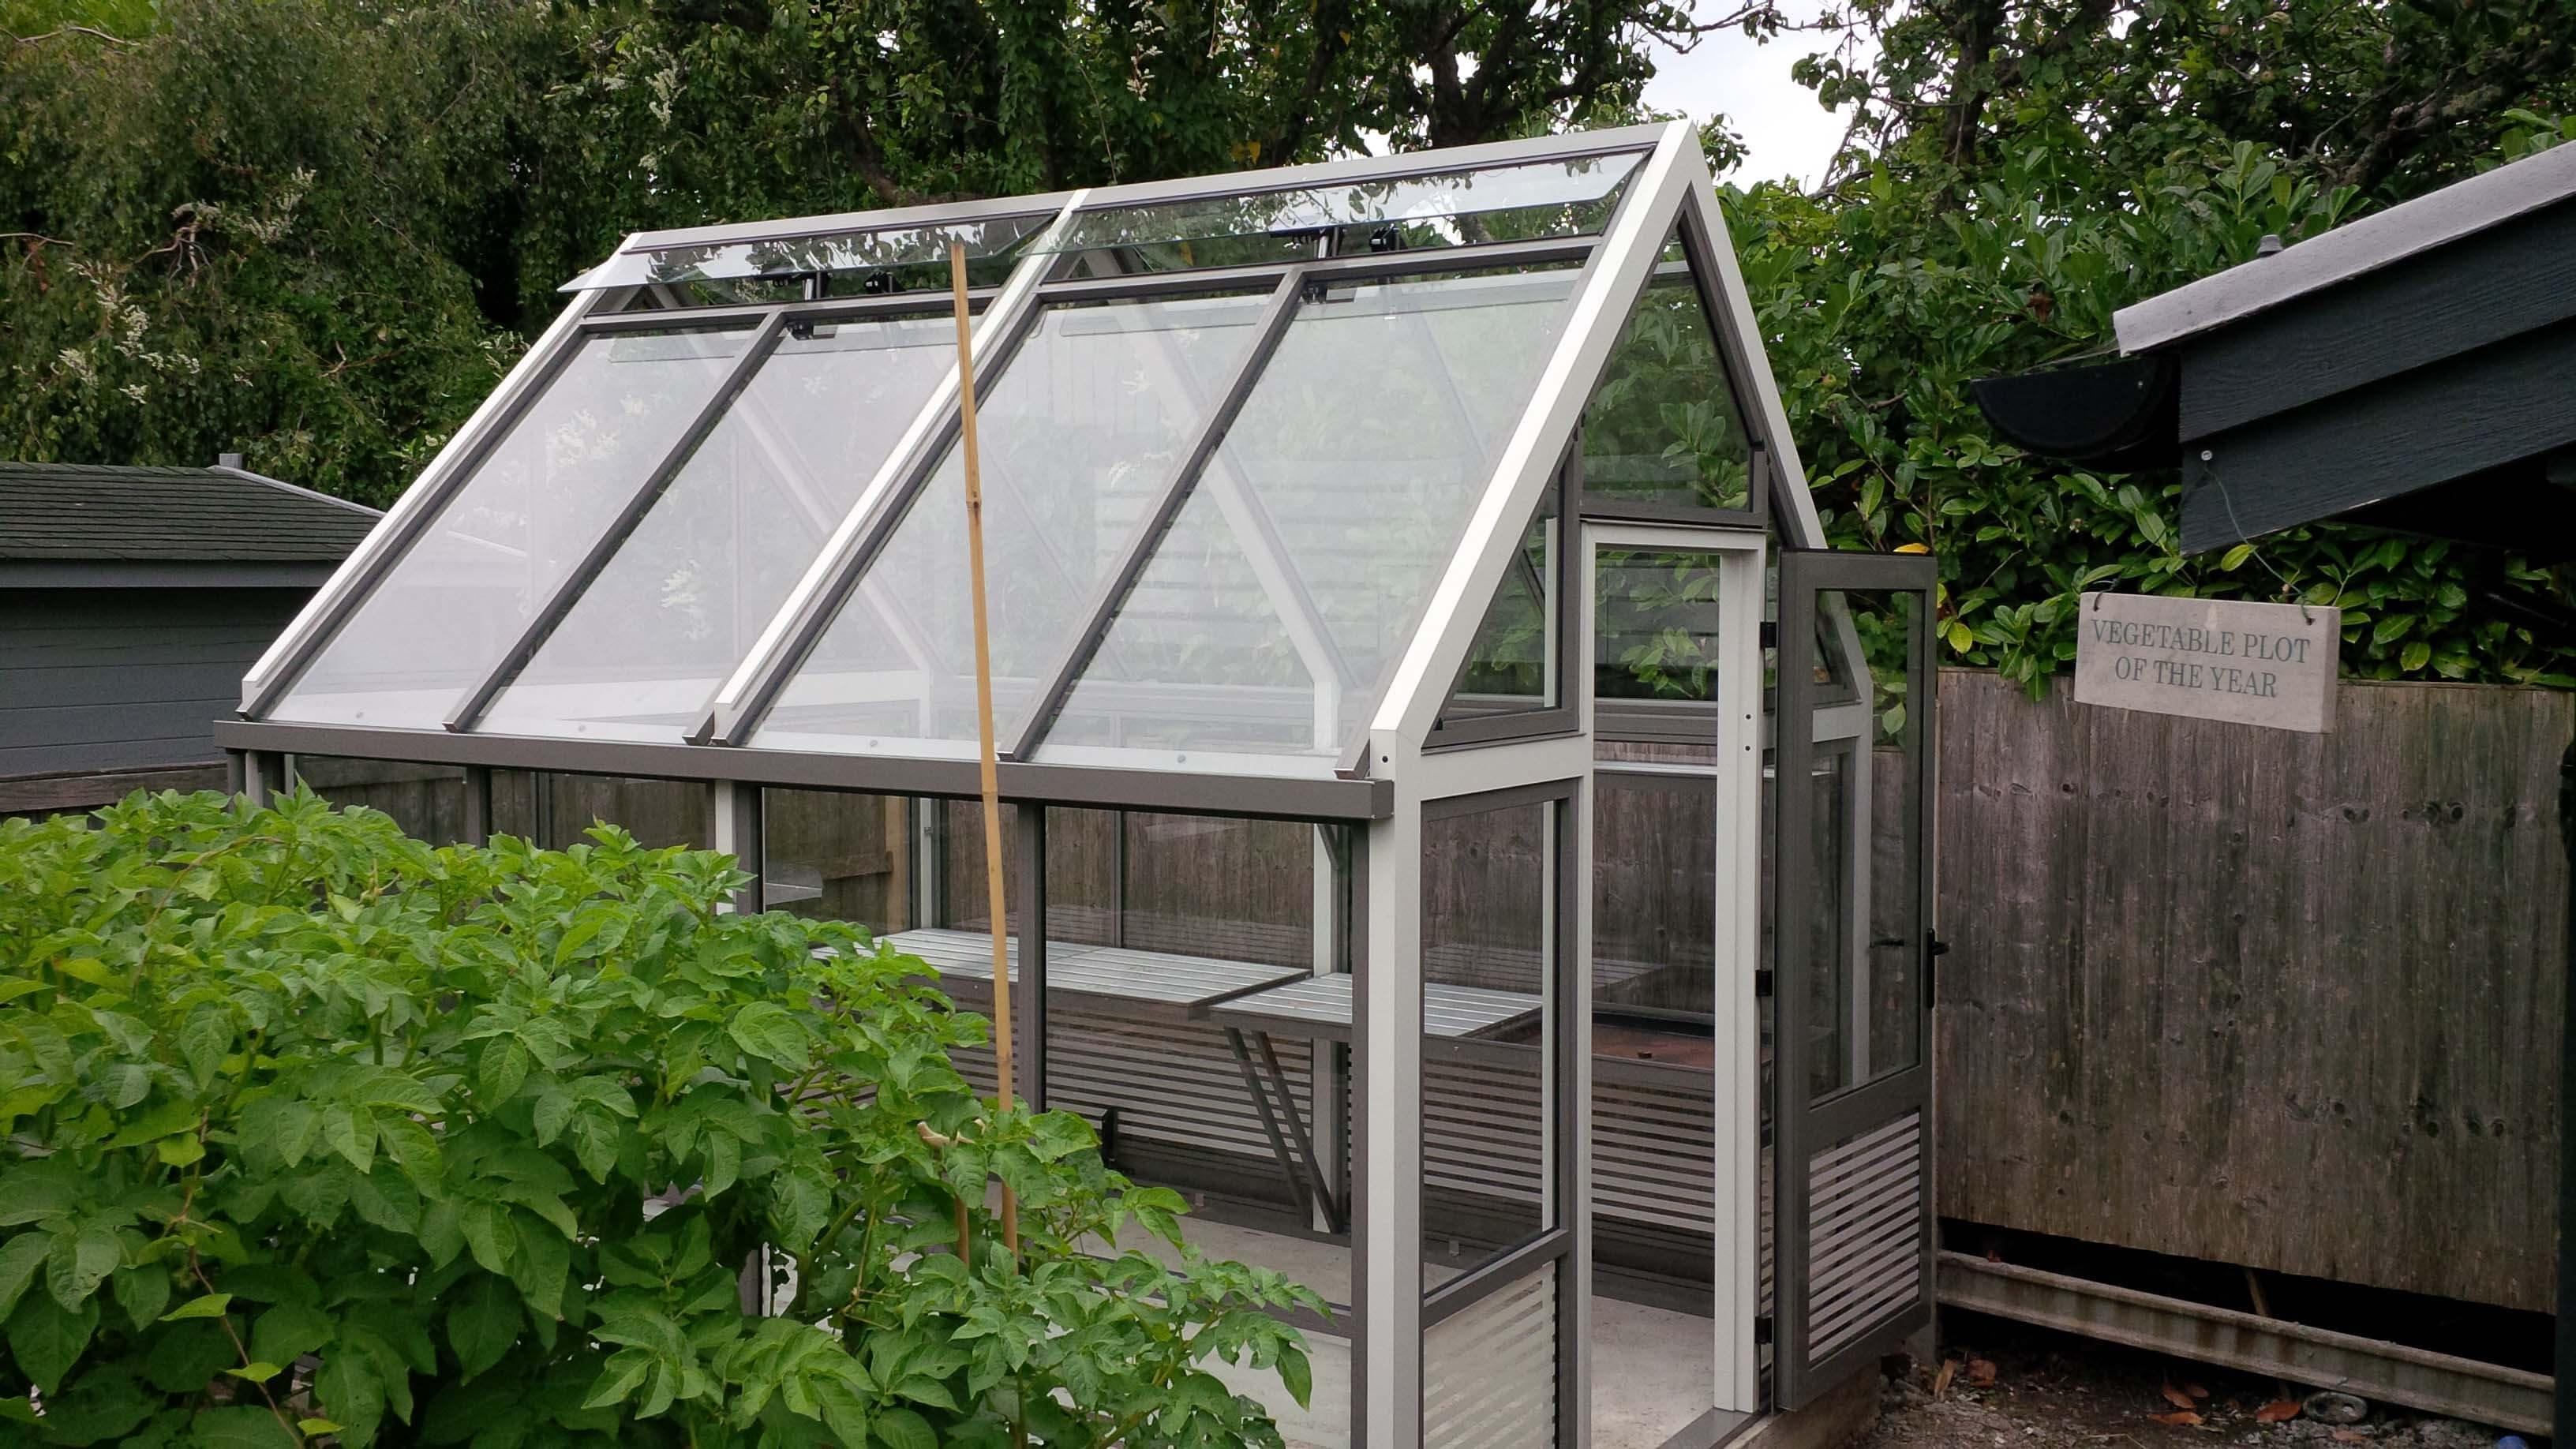 New aluminium striped greenhouse